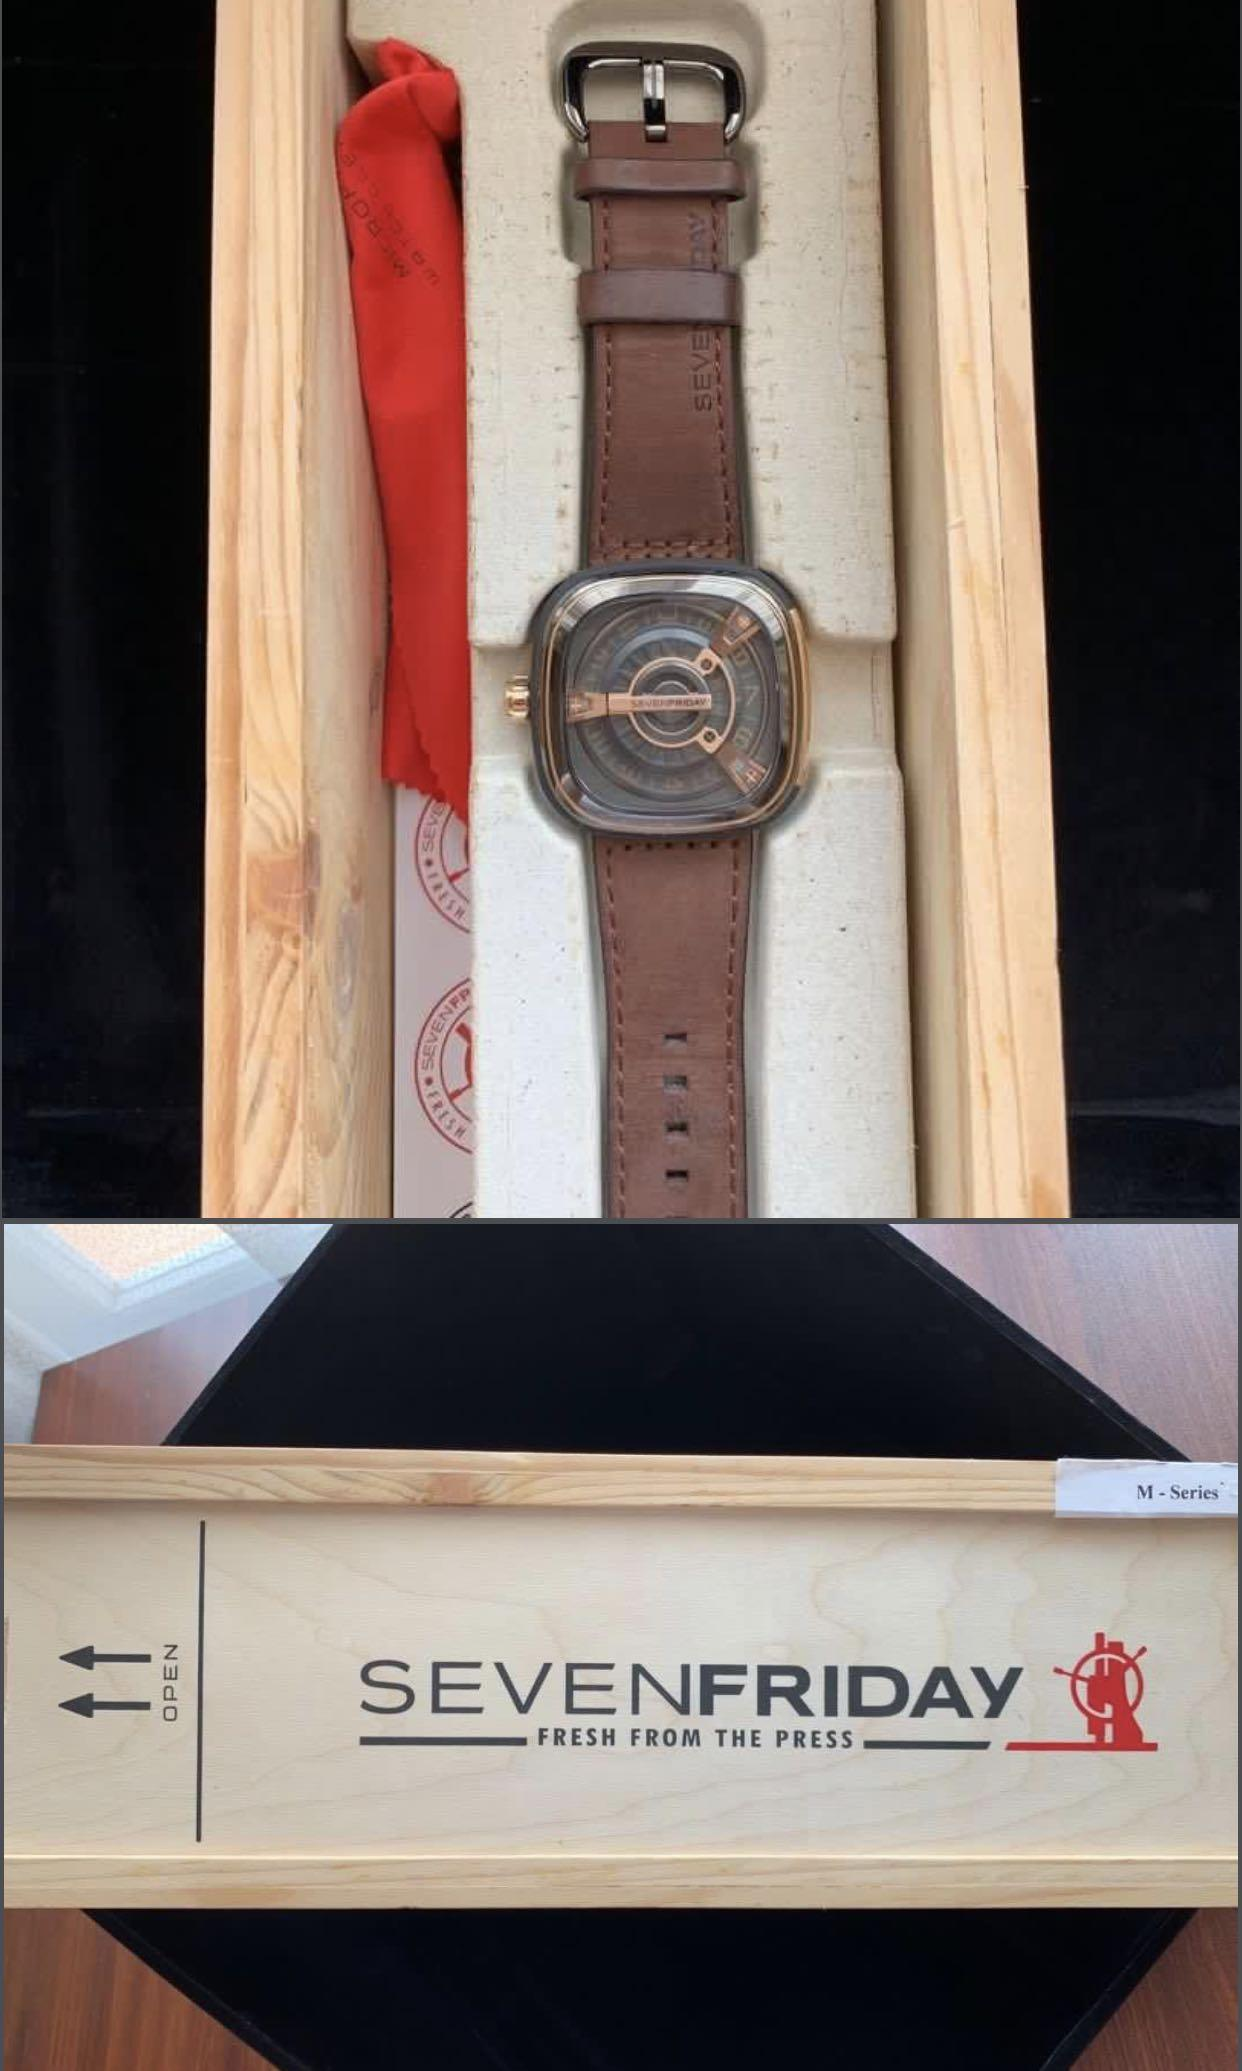 NEW PRICE!!! ORI SEVENFRIDAY M2/02 M-series (Rose Gold & Black Brown Leather Strap)